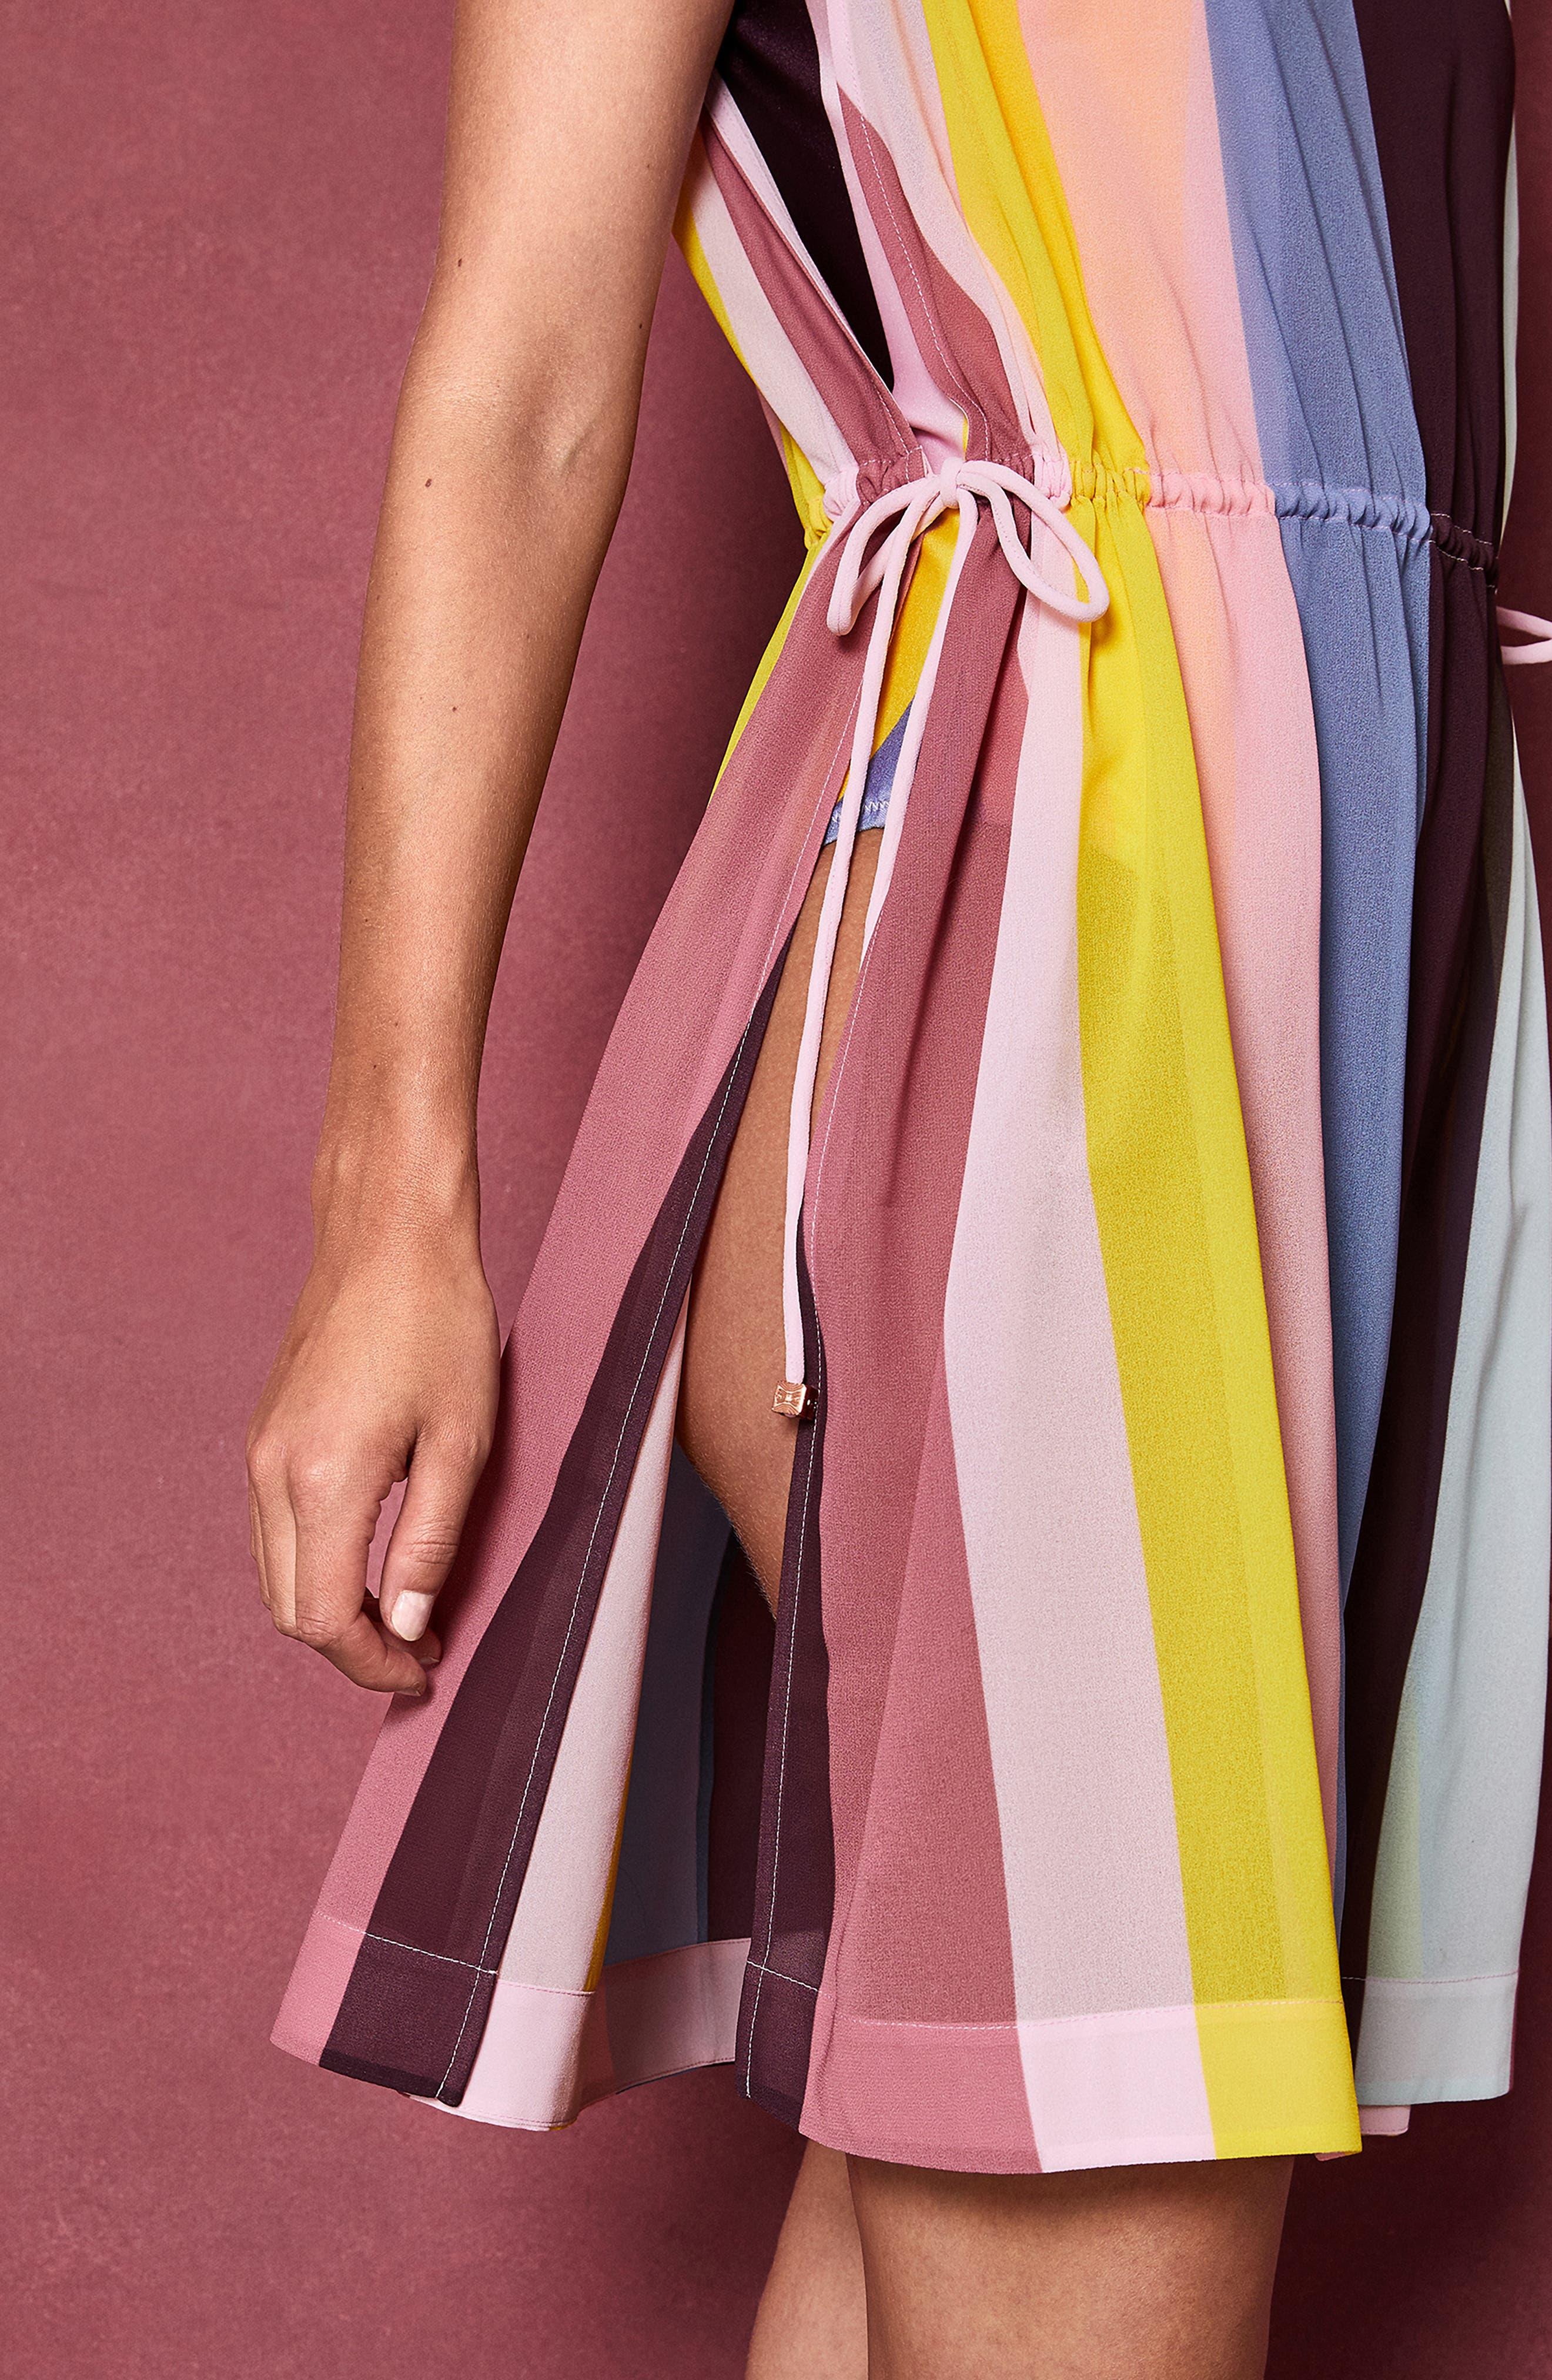 Penaree Rio Stripe Tabbard Cover-Up,                             Alternate thumbnail 8, color,                             683